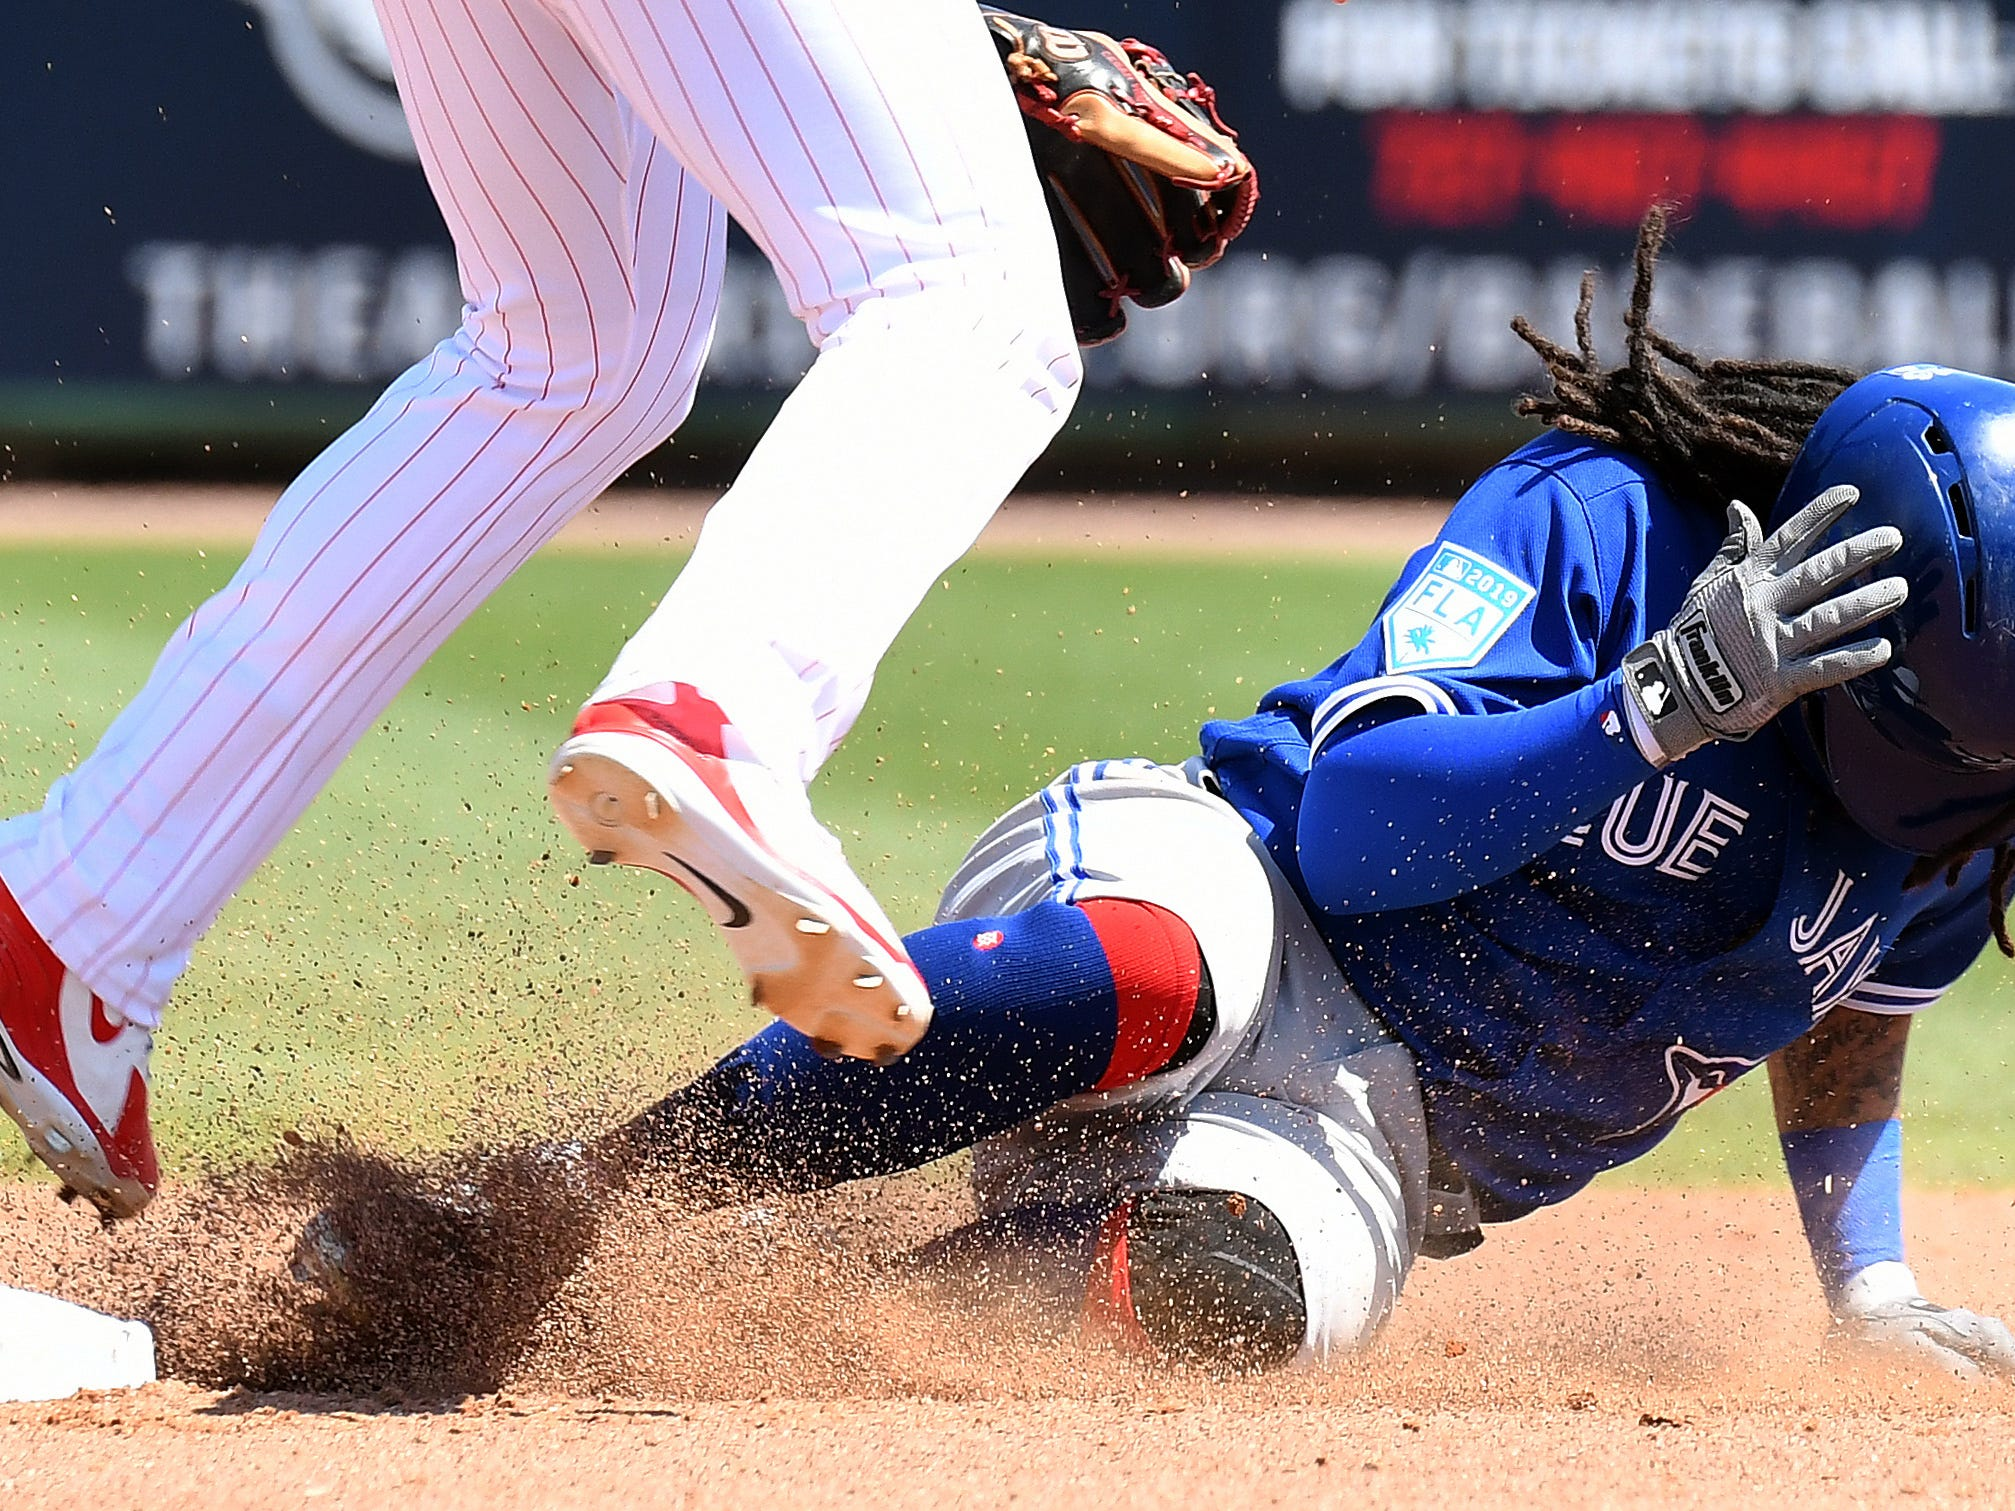 March 21: Blue Jays infielder Freddy Galvis ducks as Philadelphia's Cesar Hernandez tries to turn a double play.